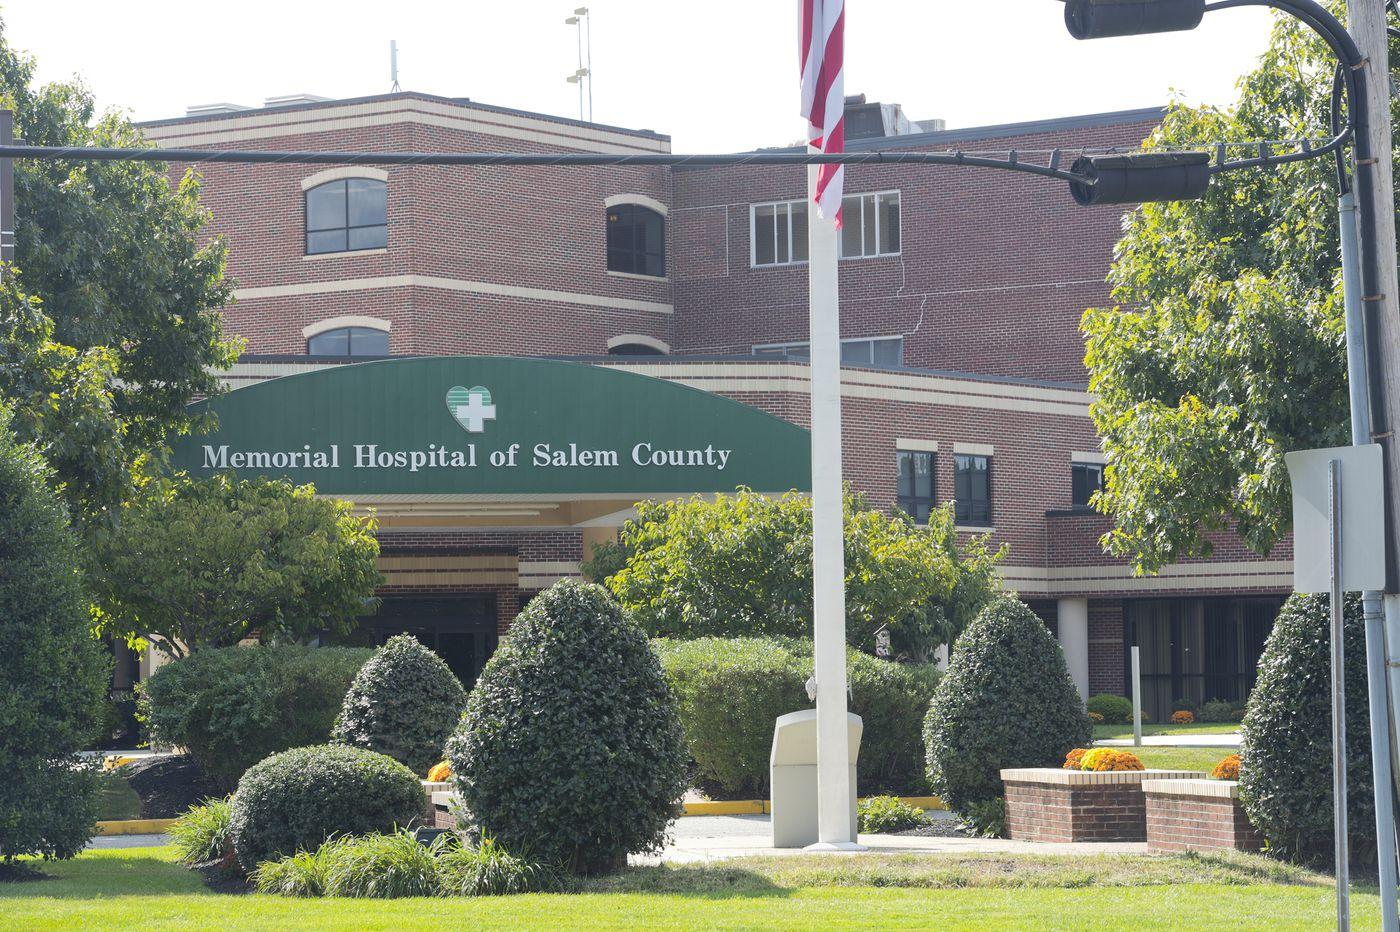 Meeting set on sale of Memorial Hospital of Salem County